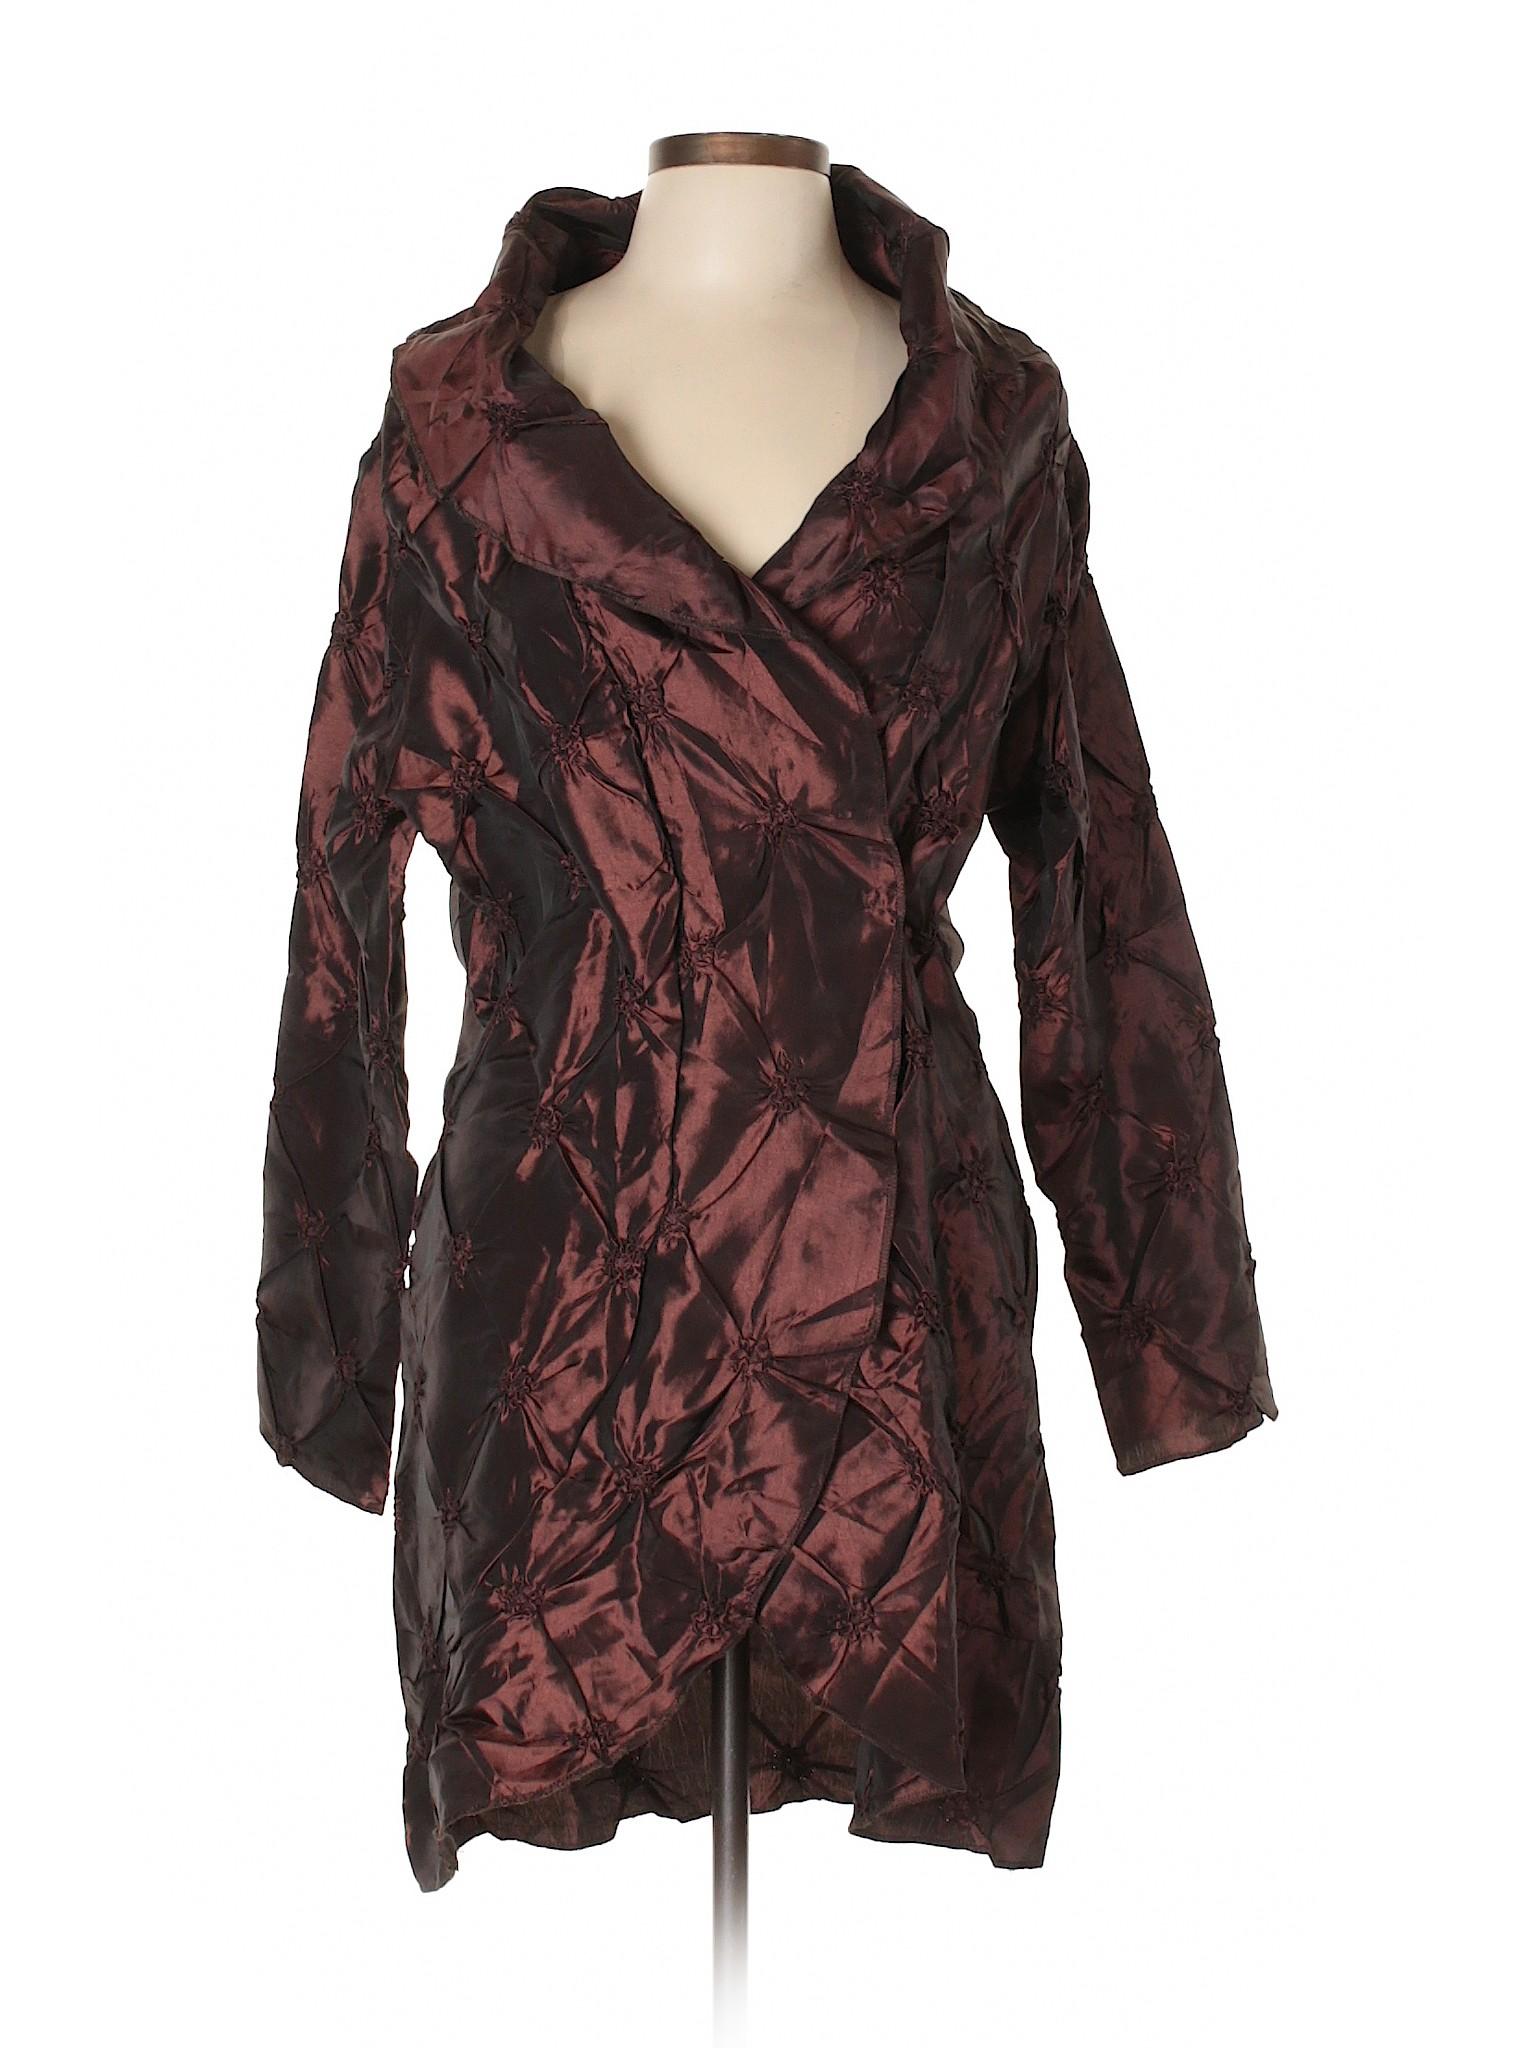 Silk Jacket leisure Boutique Boutique Box leisure Box Silk Twfpq8